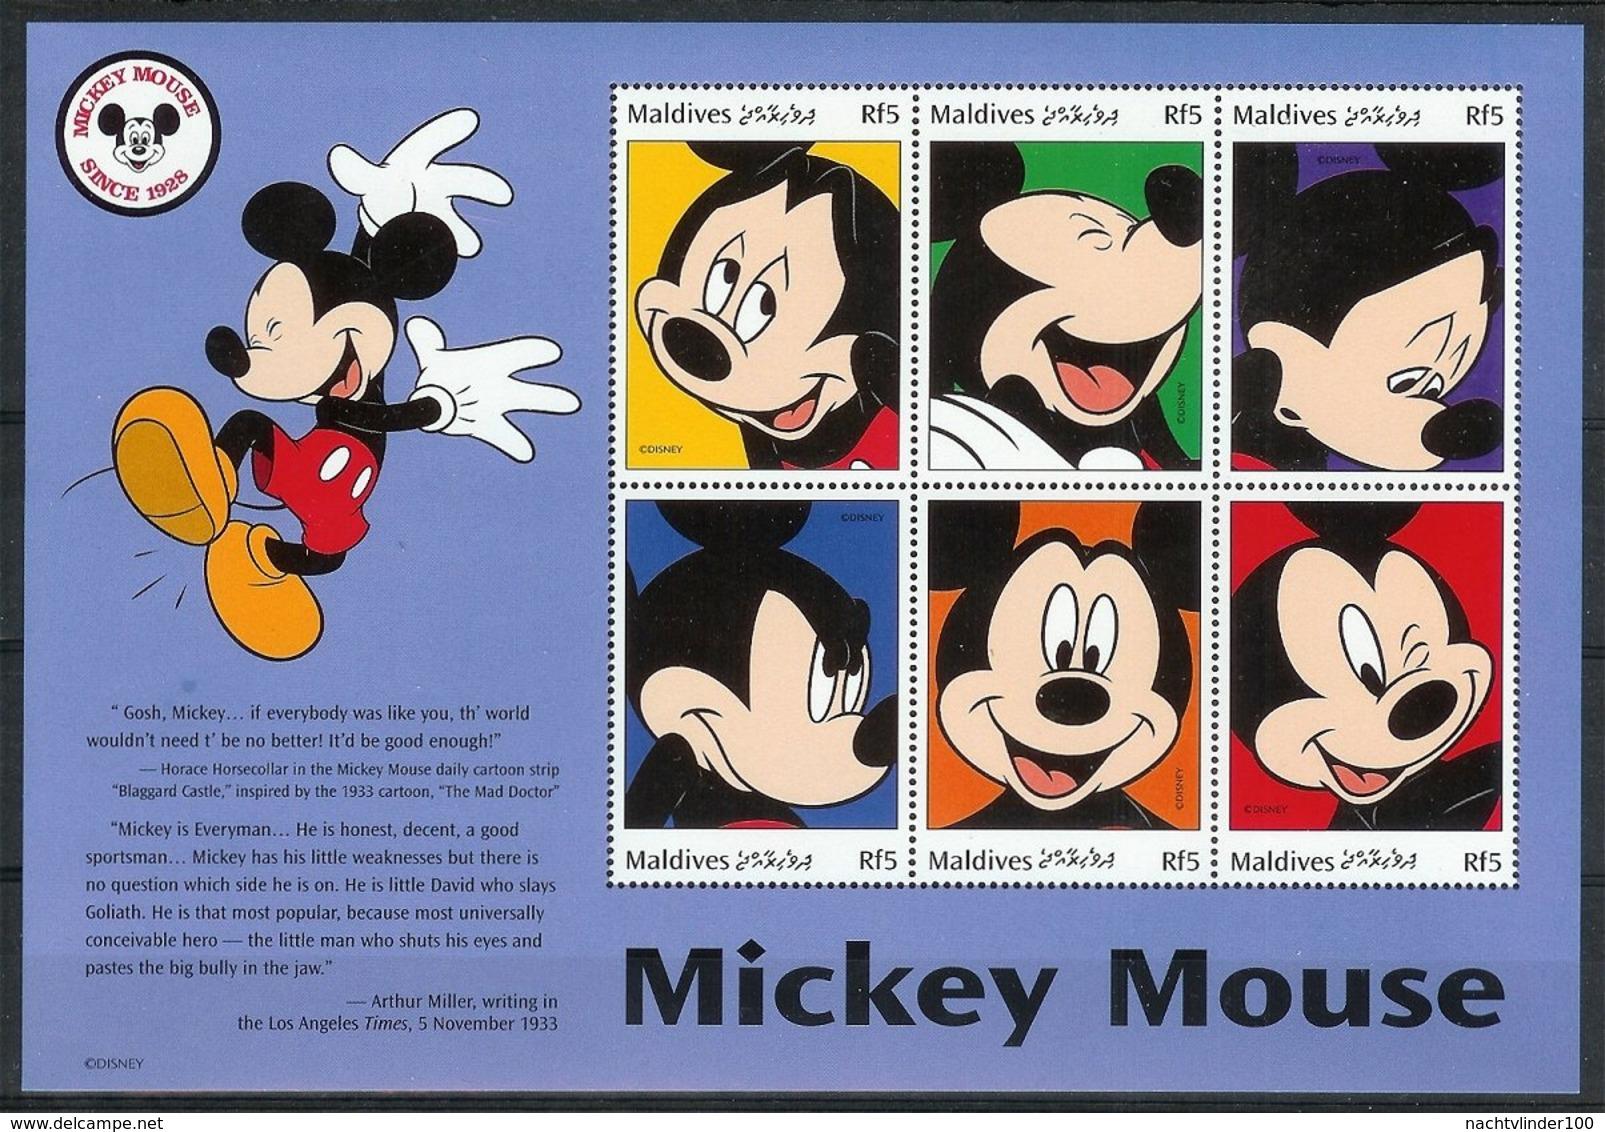 Nfe477-482b WALT DISNEY --- MICKEY MINNIE GOOFY PLUTO DONALD DAISY --- MALDIVES 1999 PF/MNH - Disney